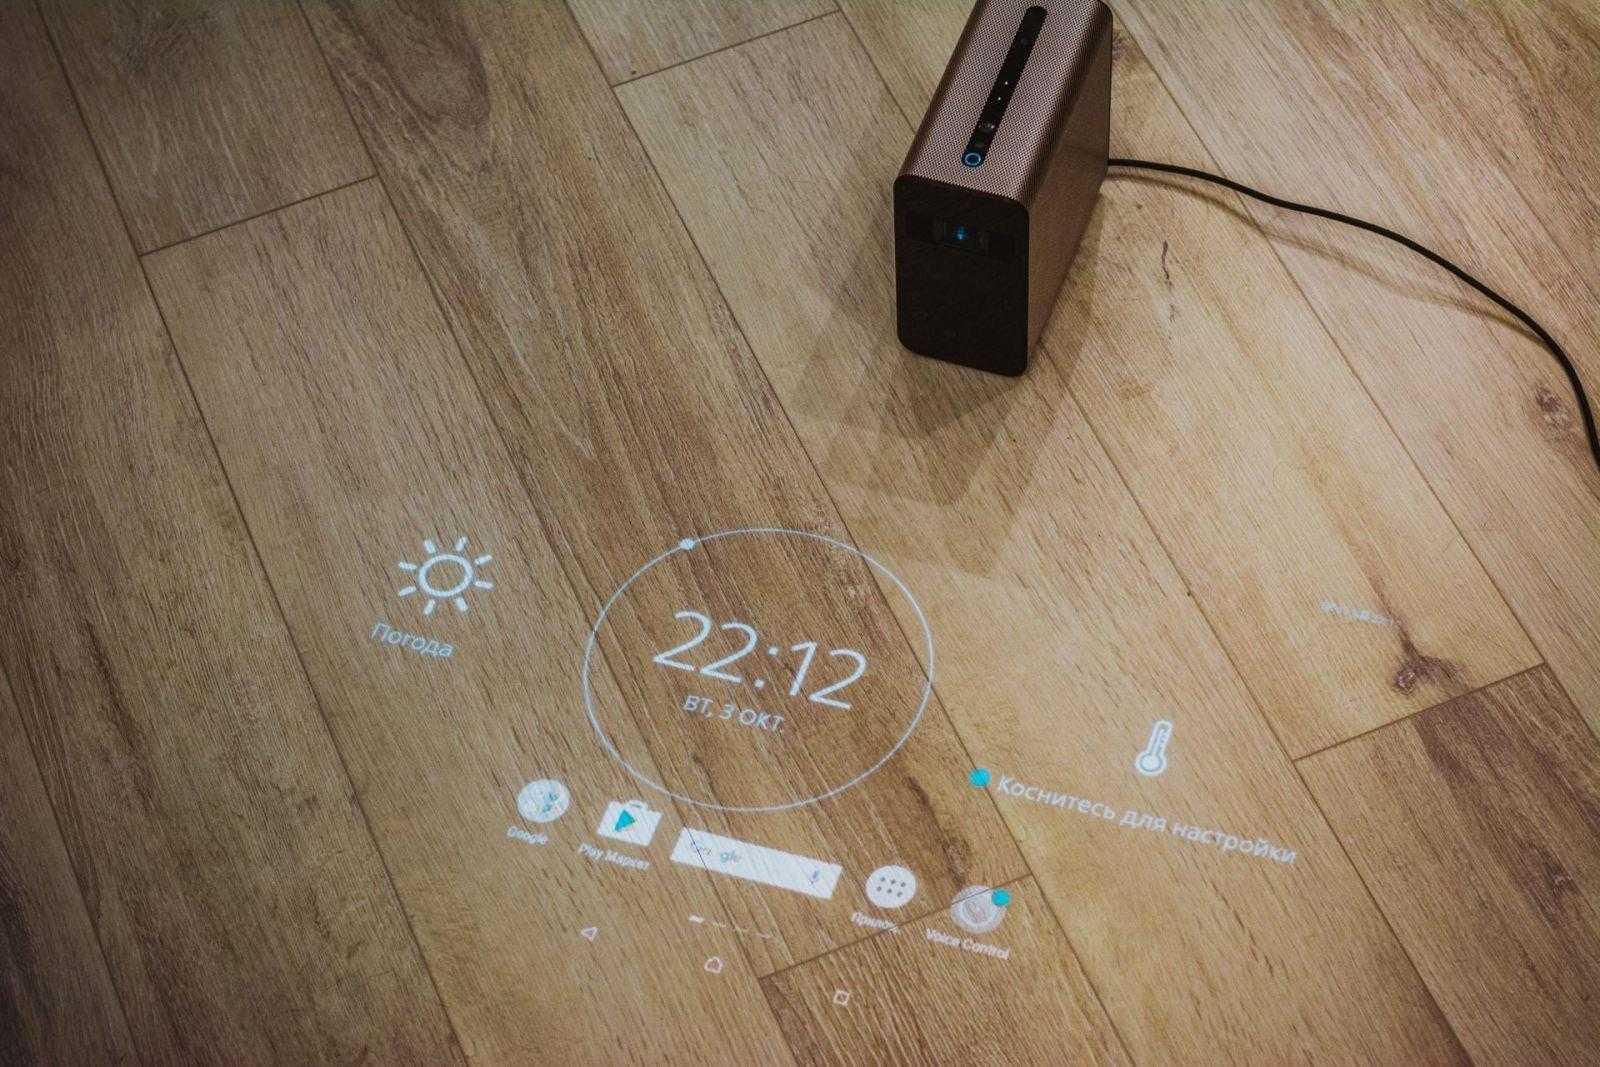 DSC 5969 - Обзор проектора Sony Xperia Touch. Потрогай виртуальность